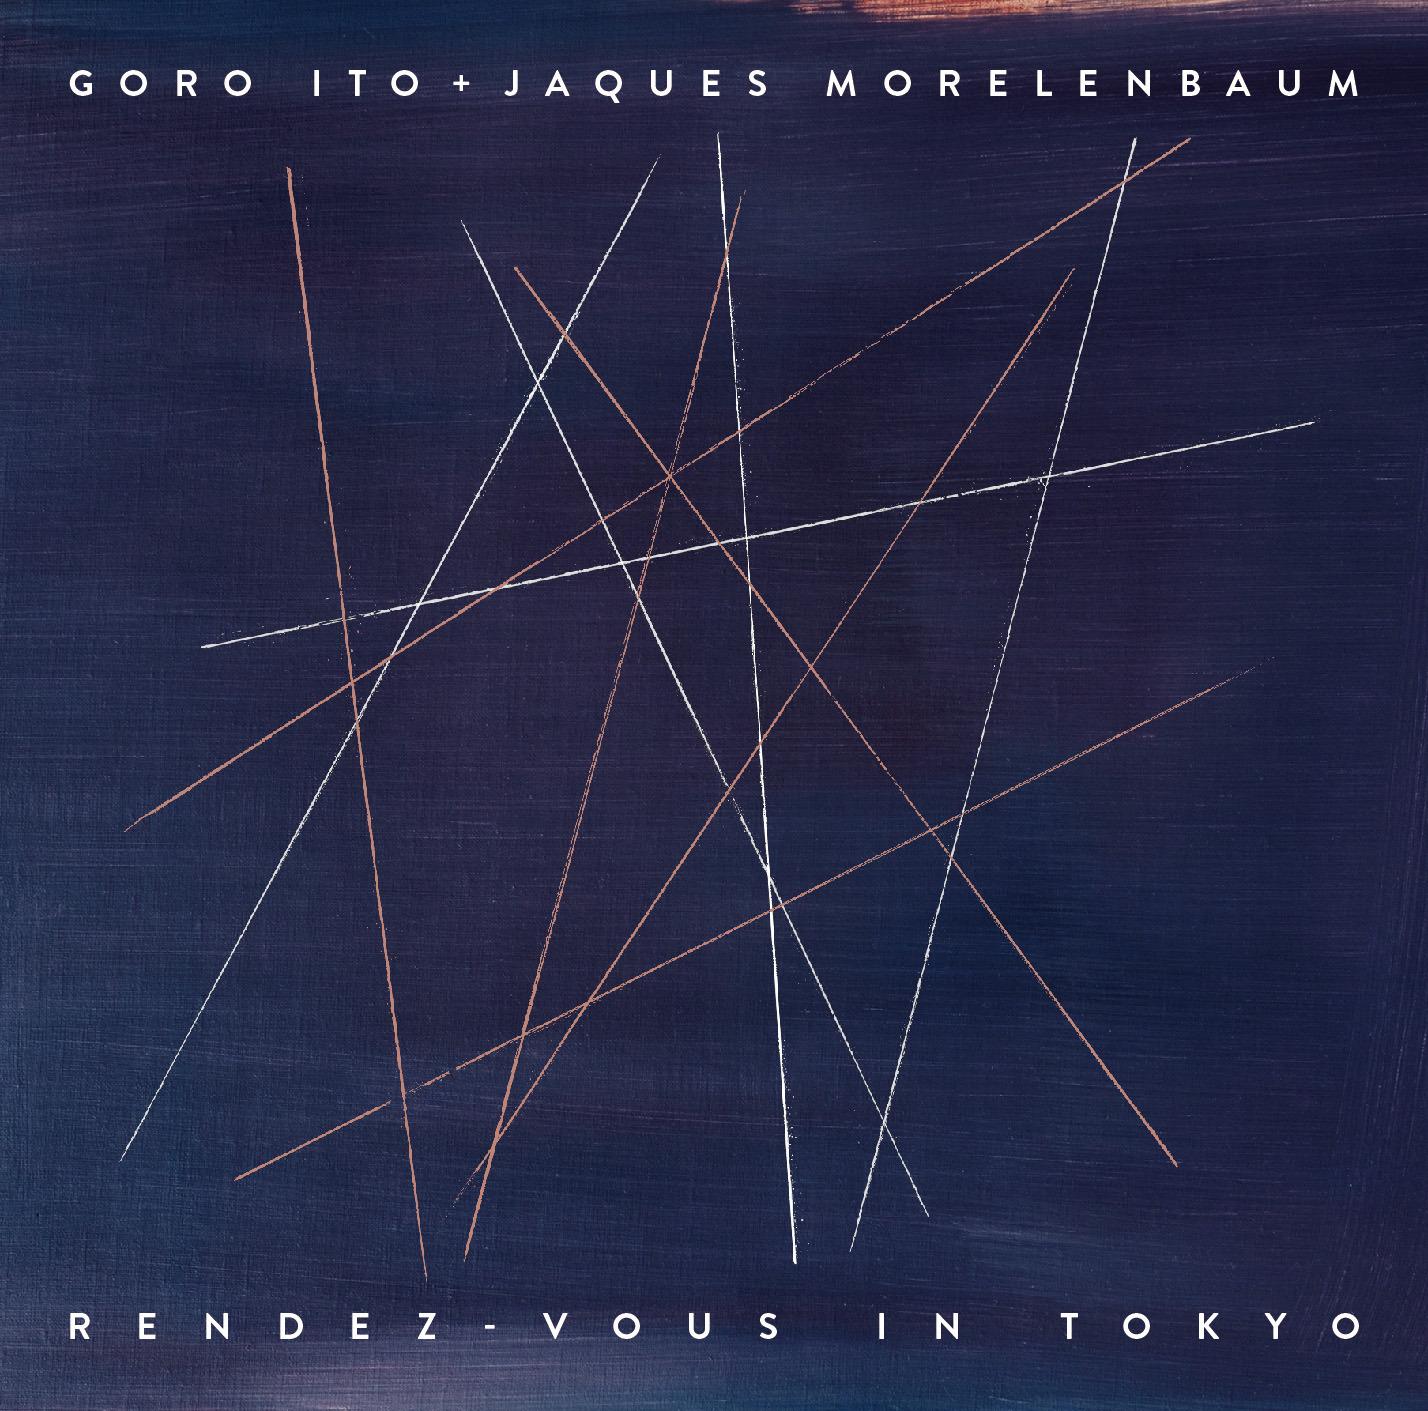 Rendez-vous In Tokyo | Goro Ito & Jacques Morelenbaum